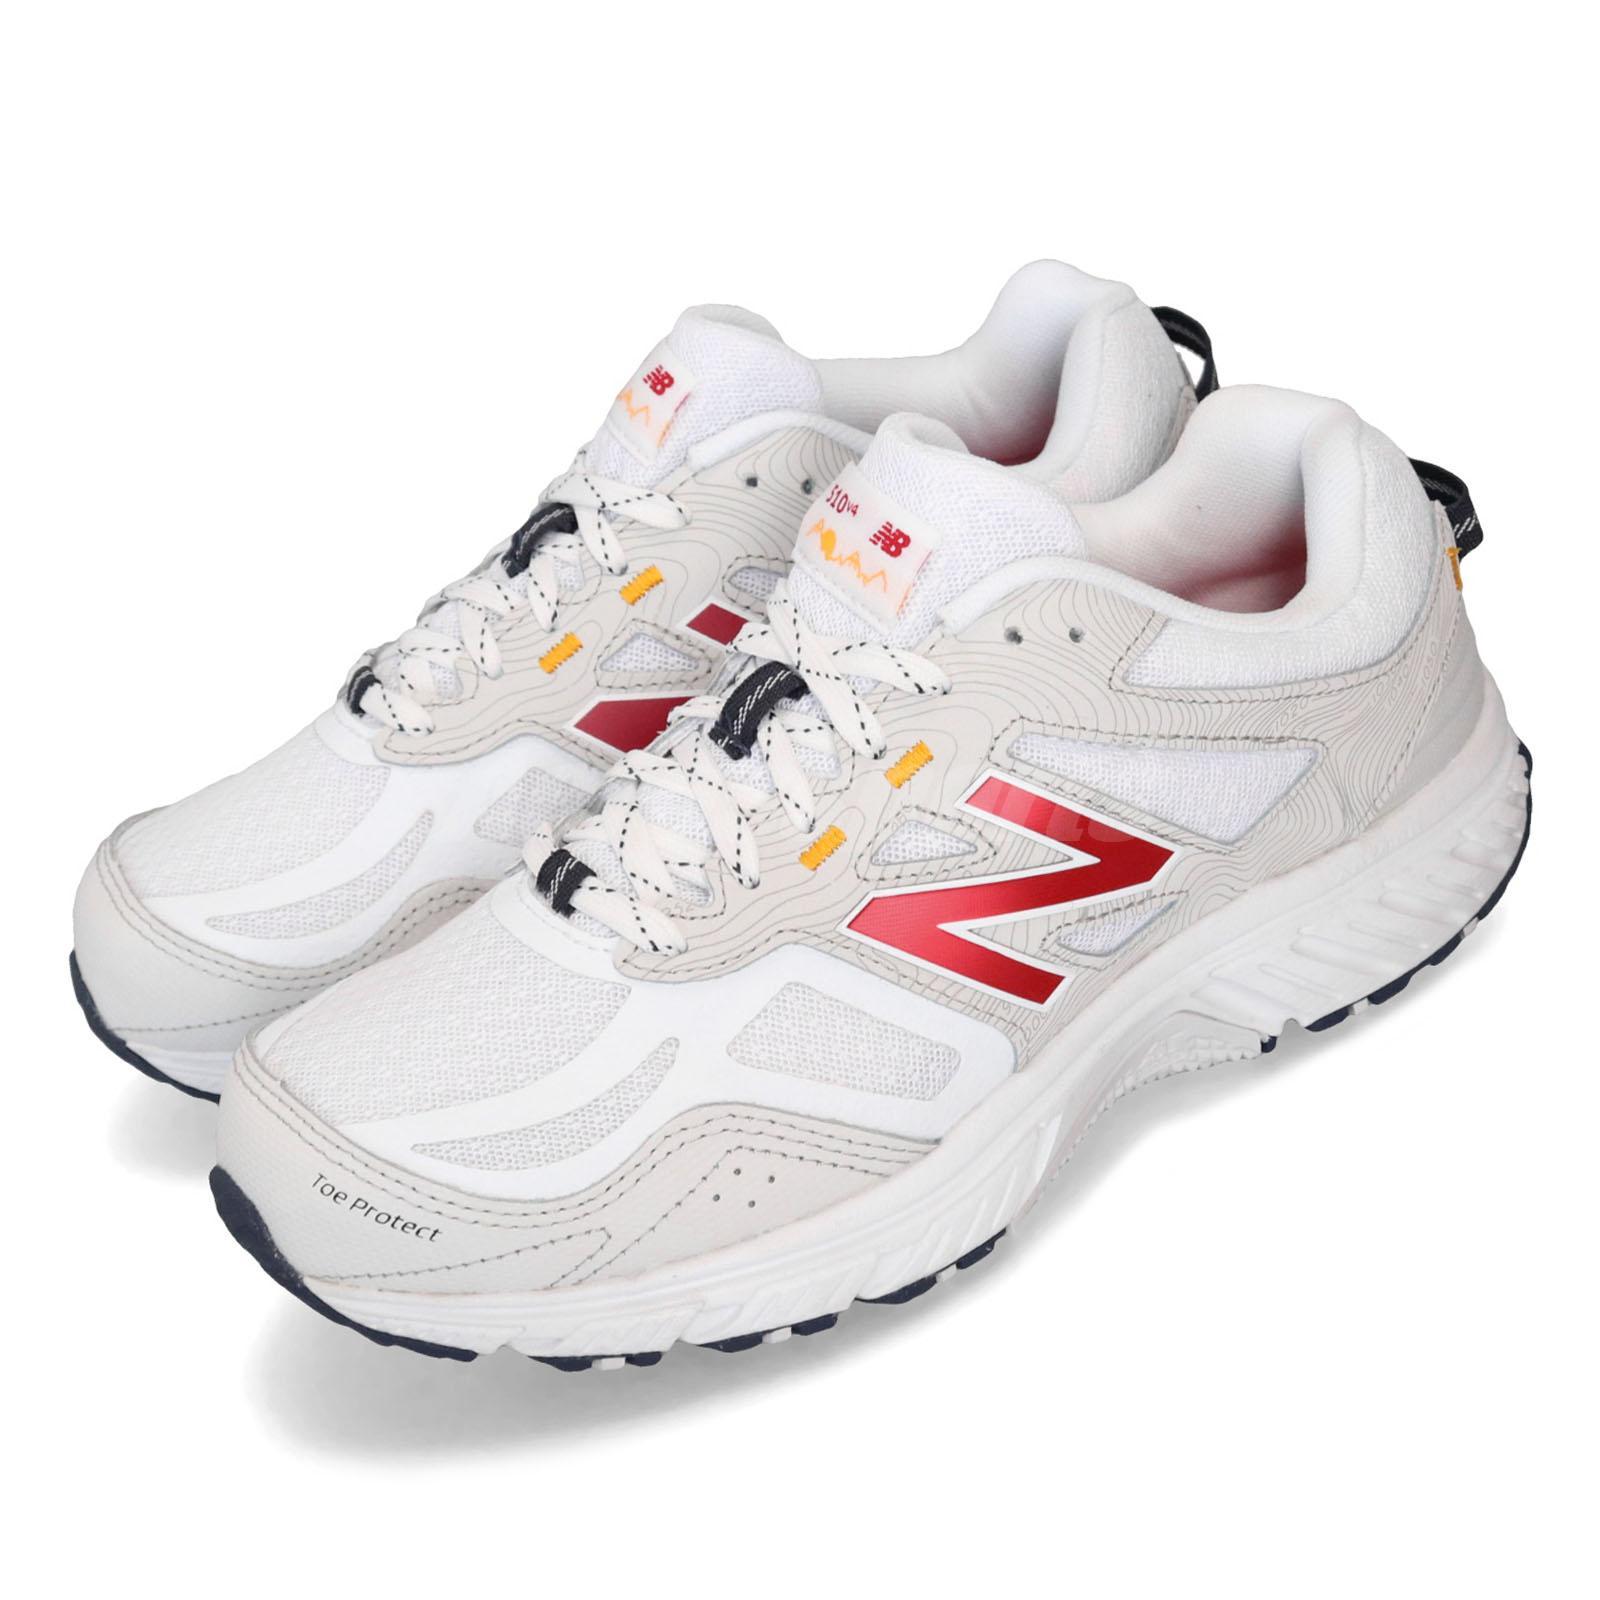 Men Women Trail Running Shoes Sneakers